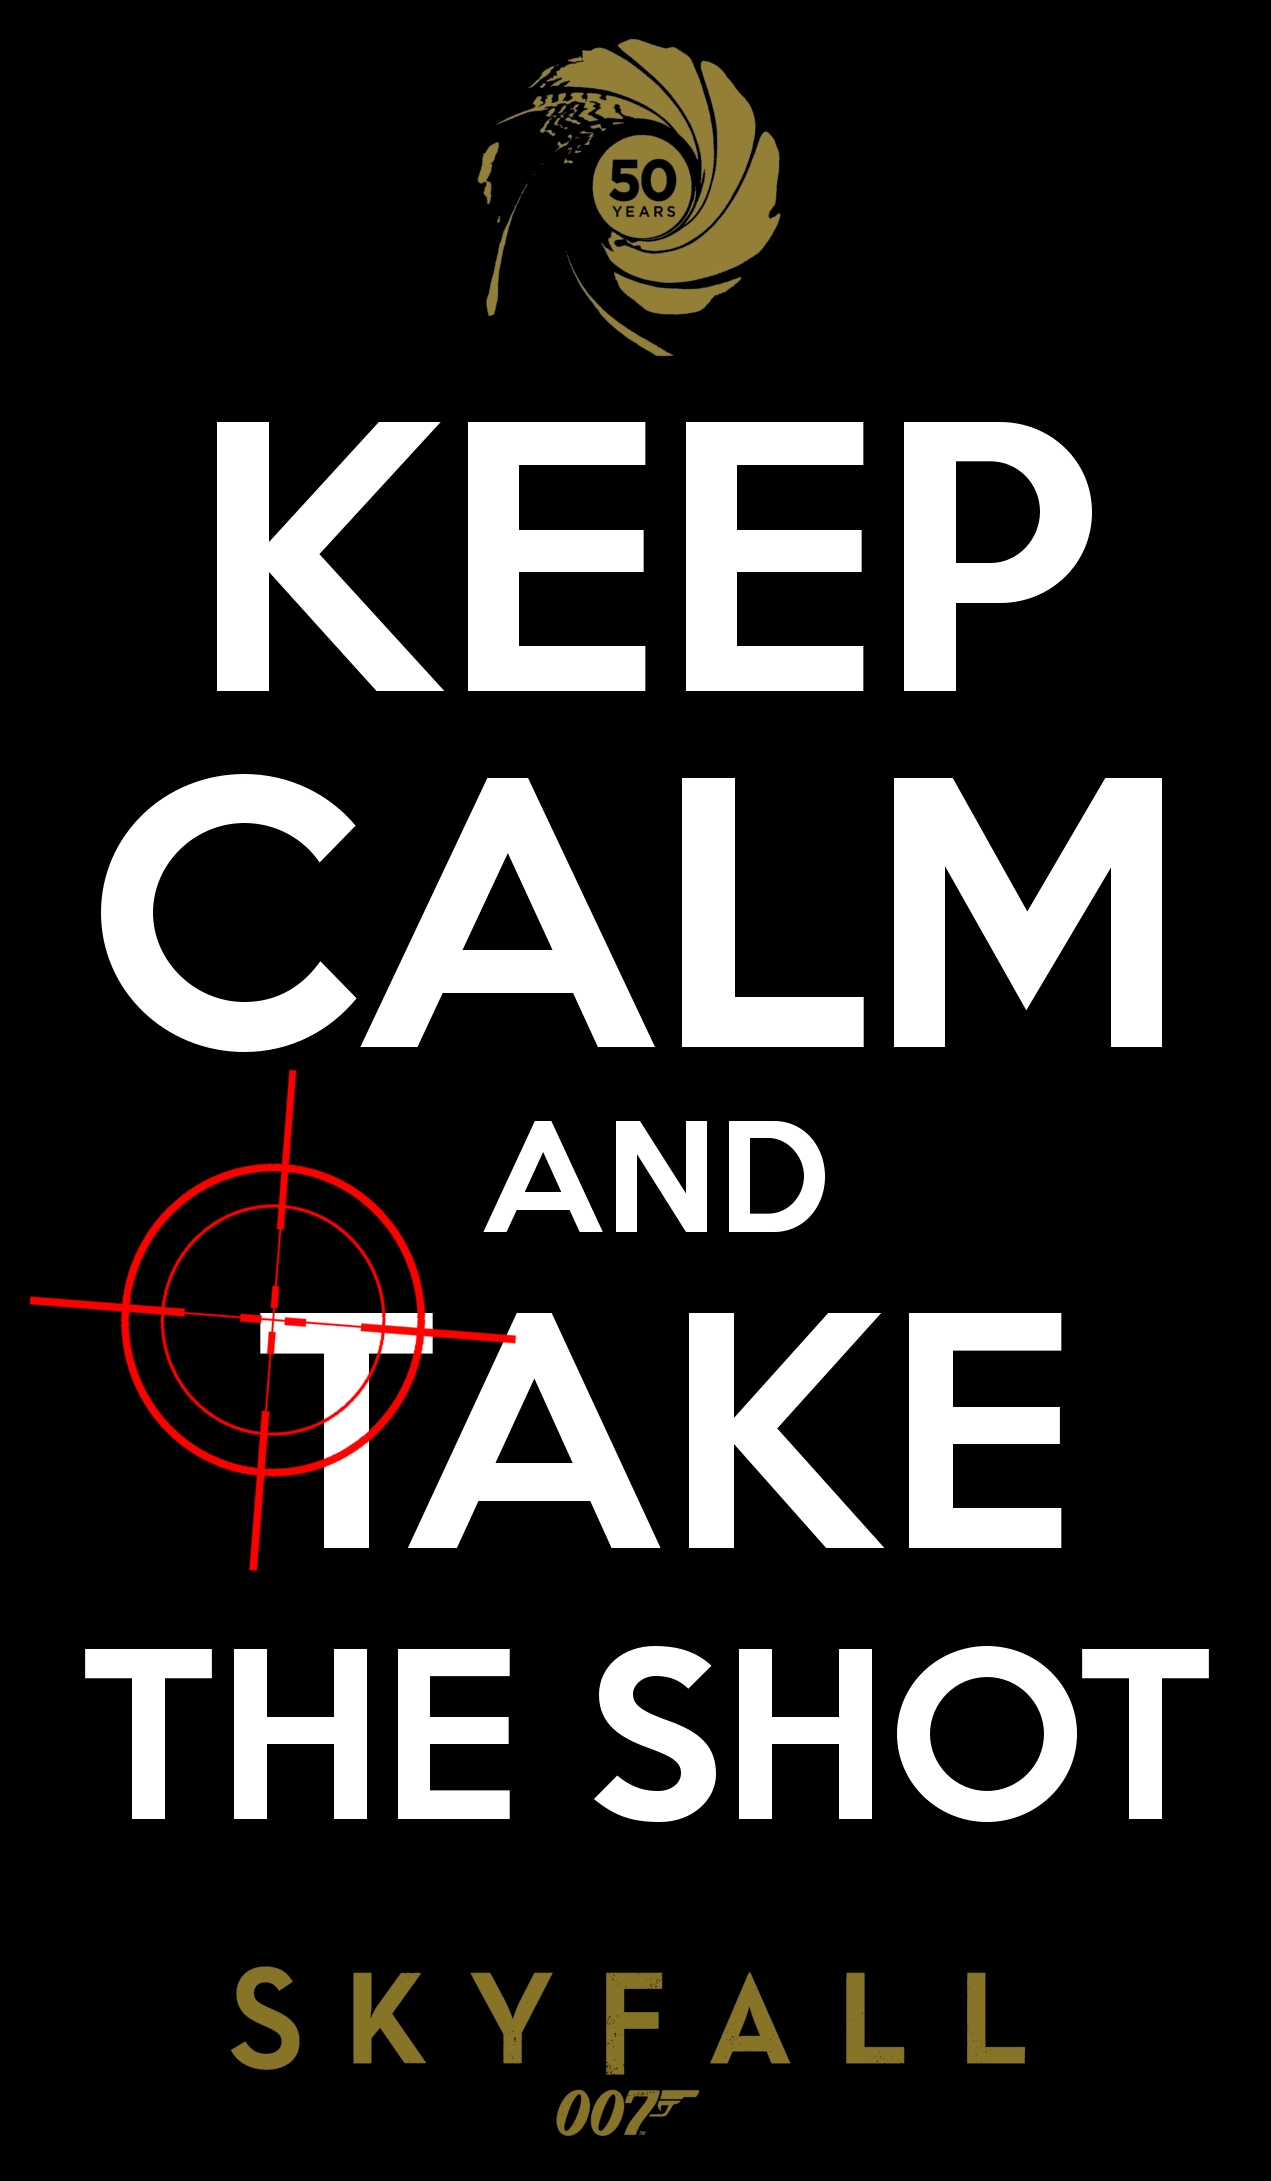 Keep calm and take the shot by bradymajor on deviantart